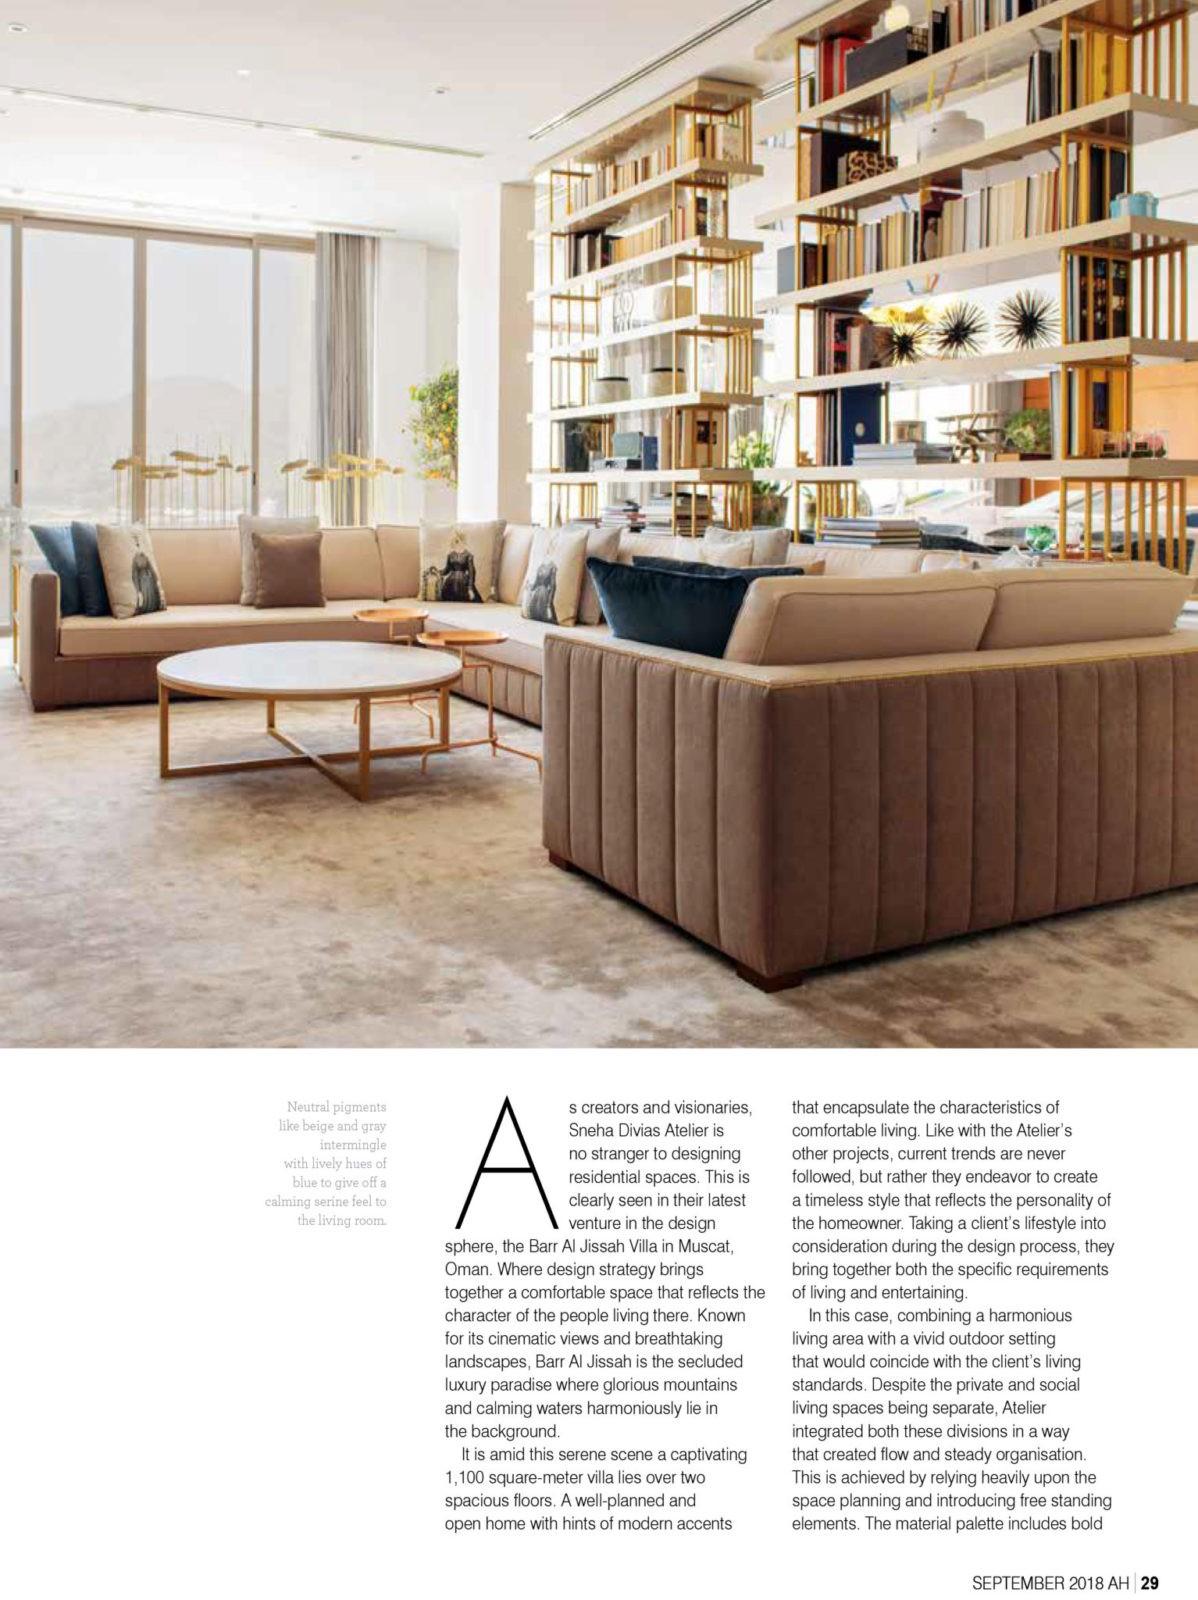 Sneha Divias Atelier -Arabian Homes Villa Bar Al Jissah